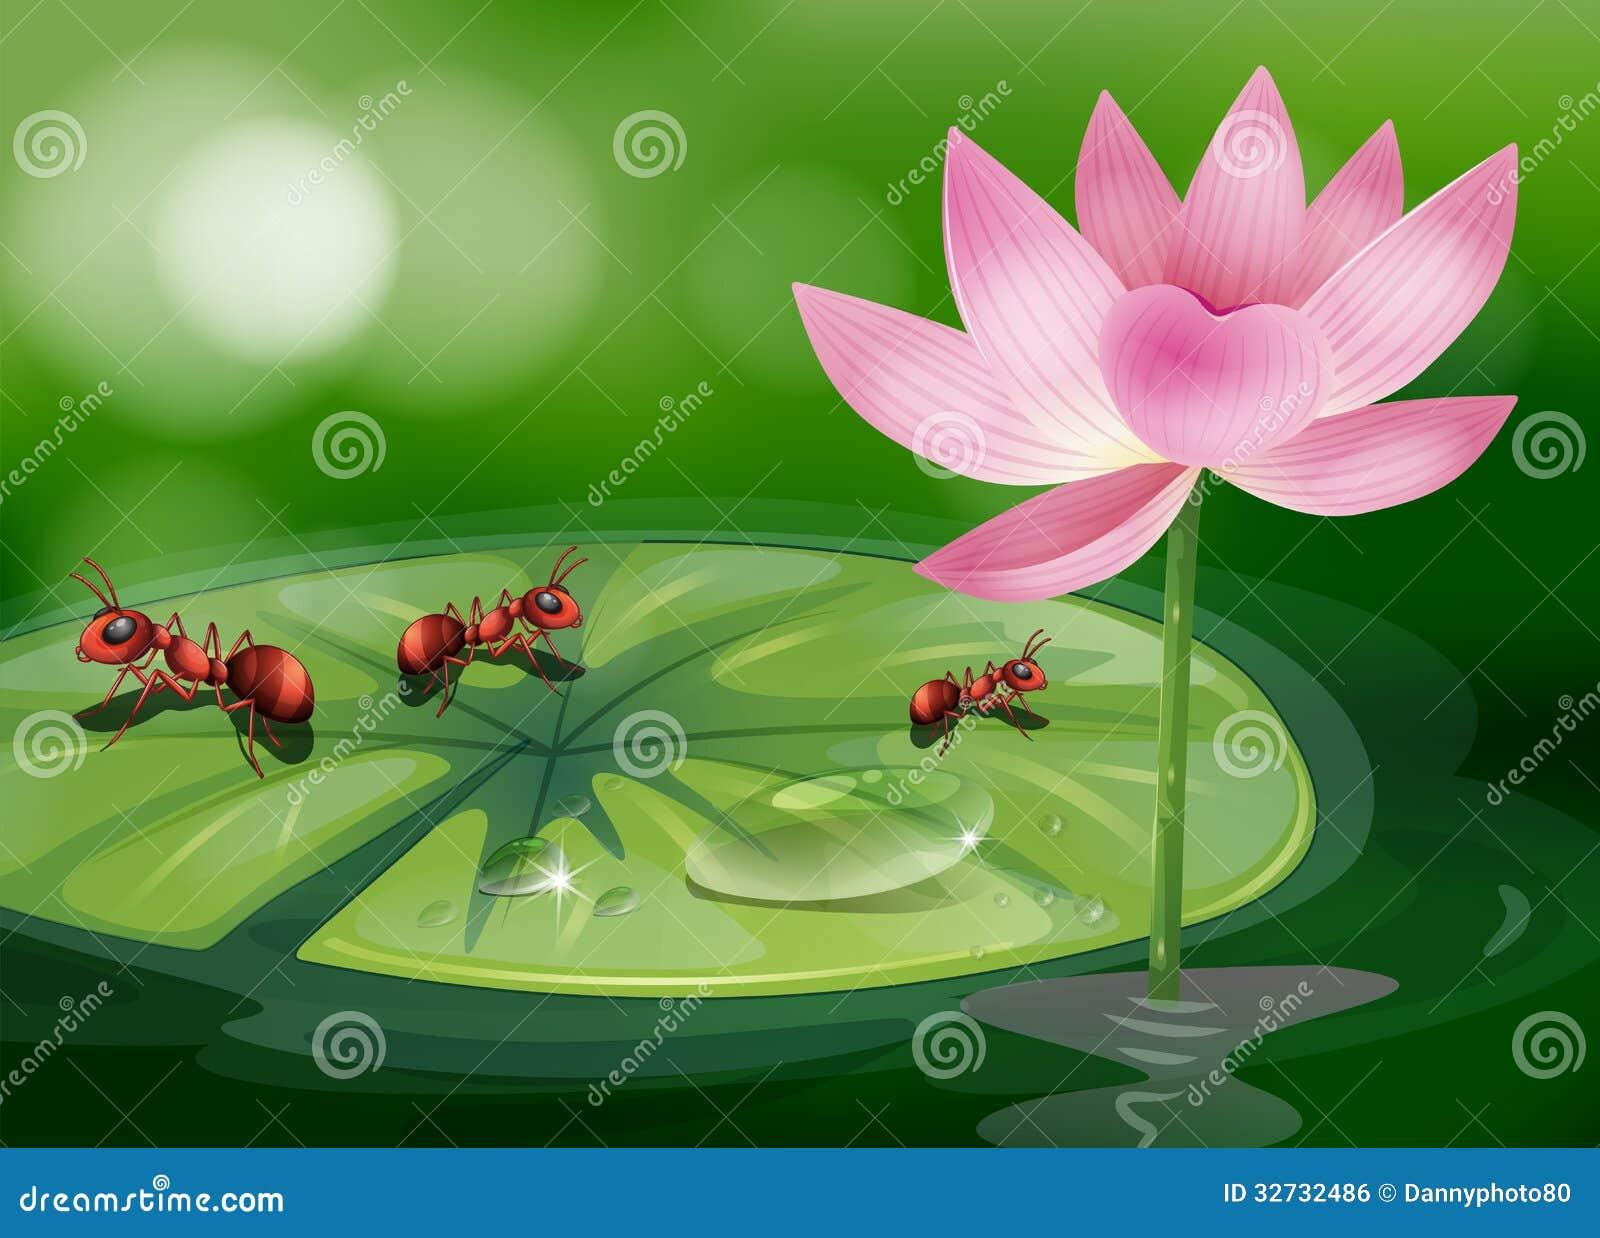 De drie mieren boven planten waterlily